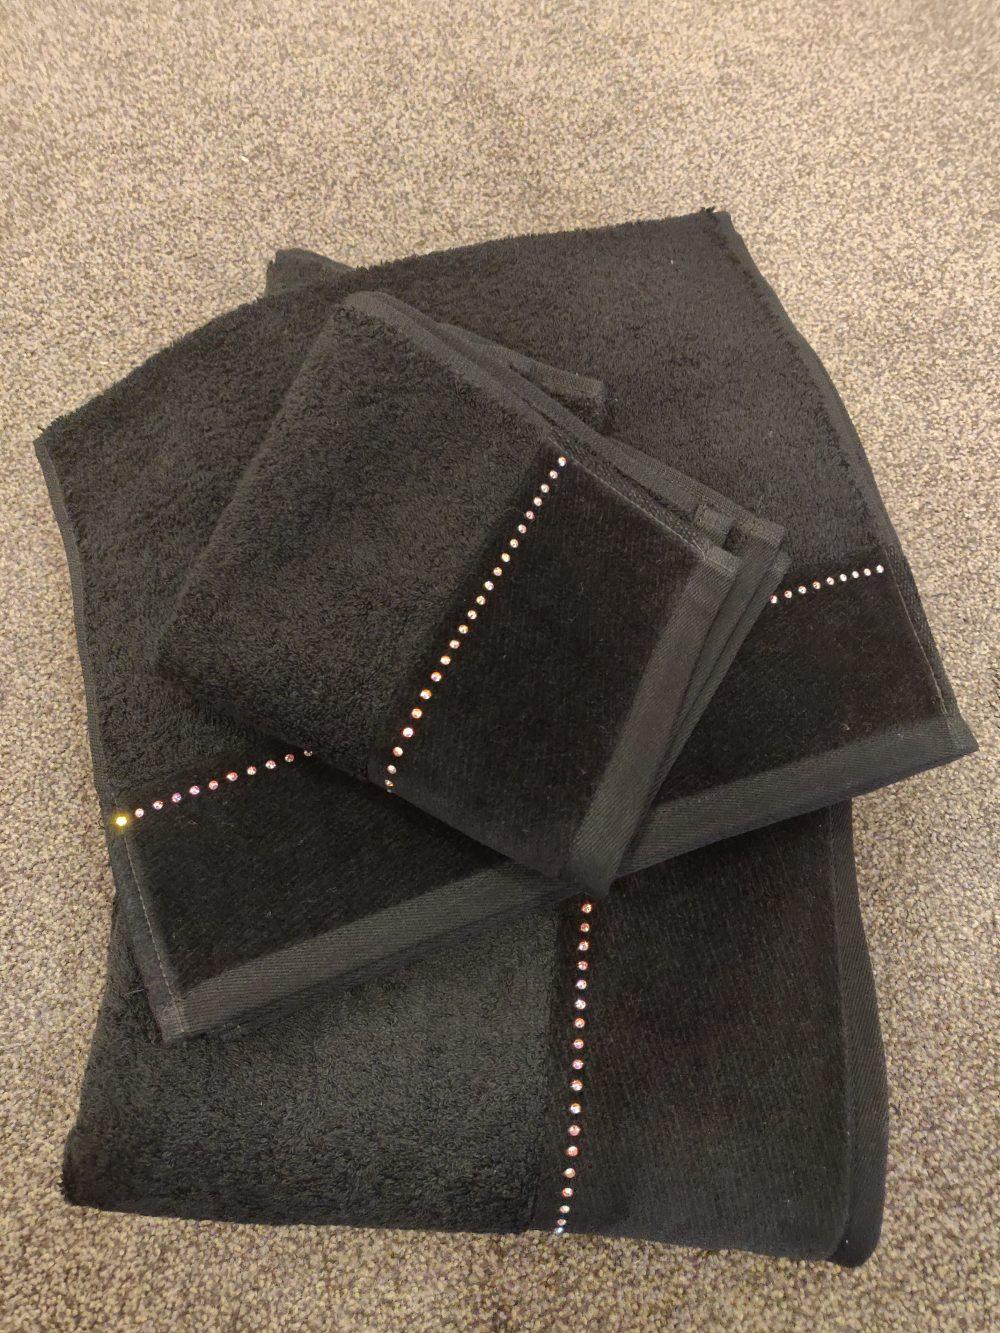 Møve håndklæde sort med bling